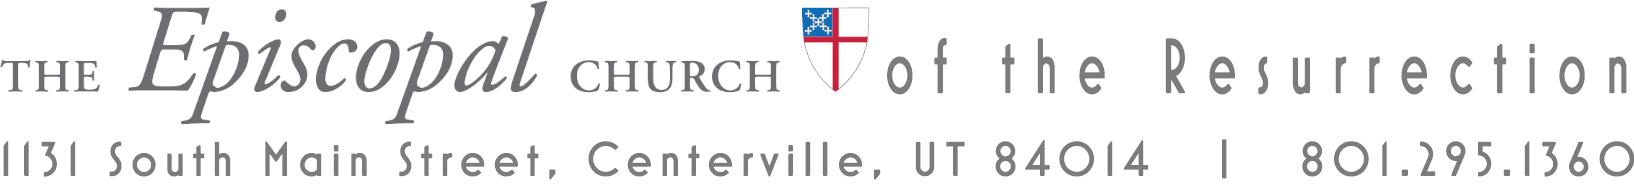 Logo for Episcopal Church of the Resurrection